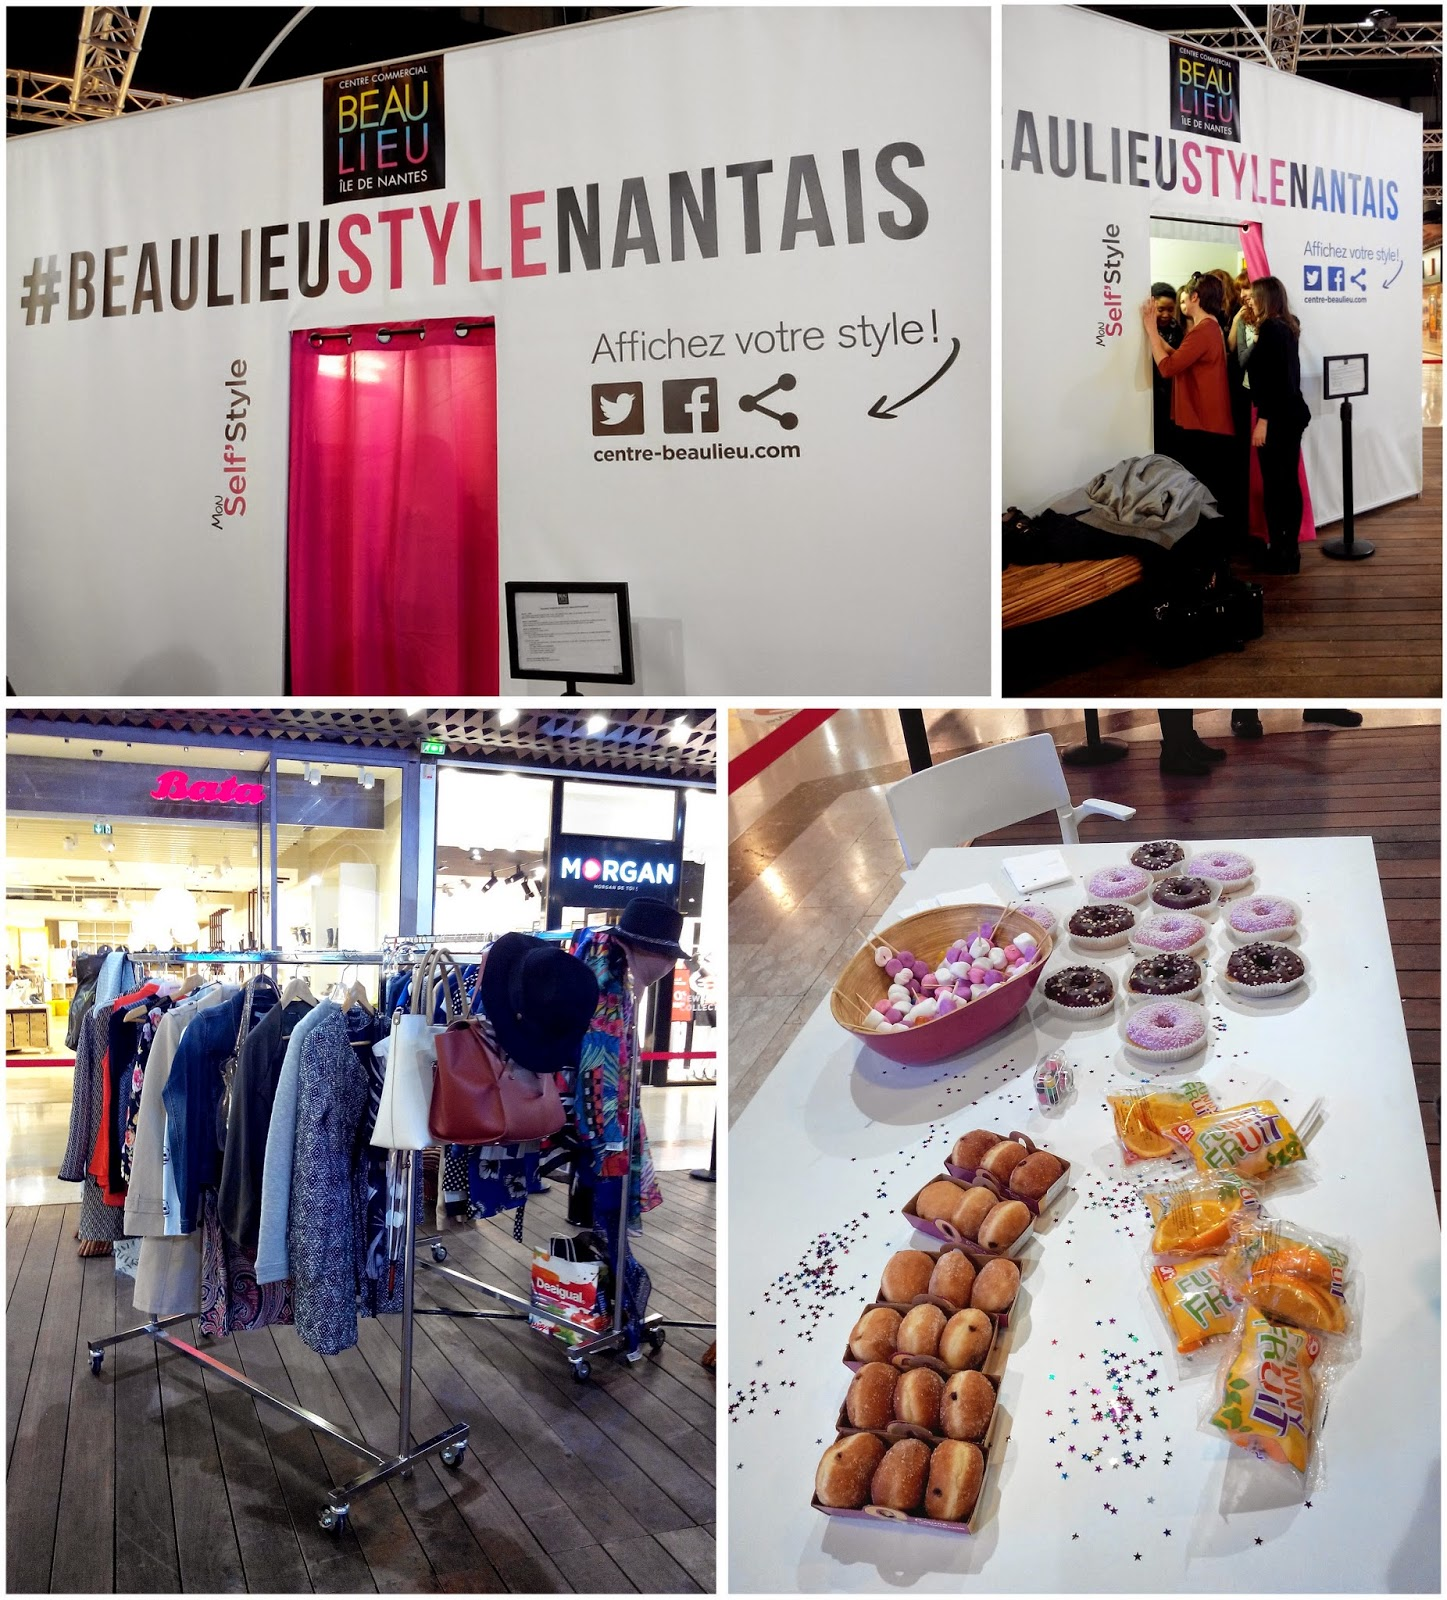 beaulieu, photomaton, blog, blogueuse, bullelodie, donnuts, vêtement